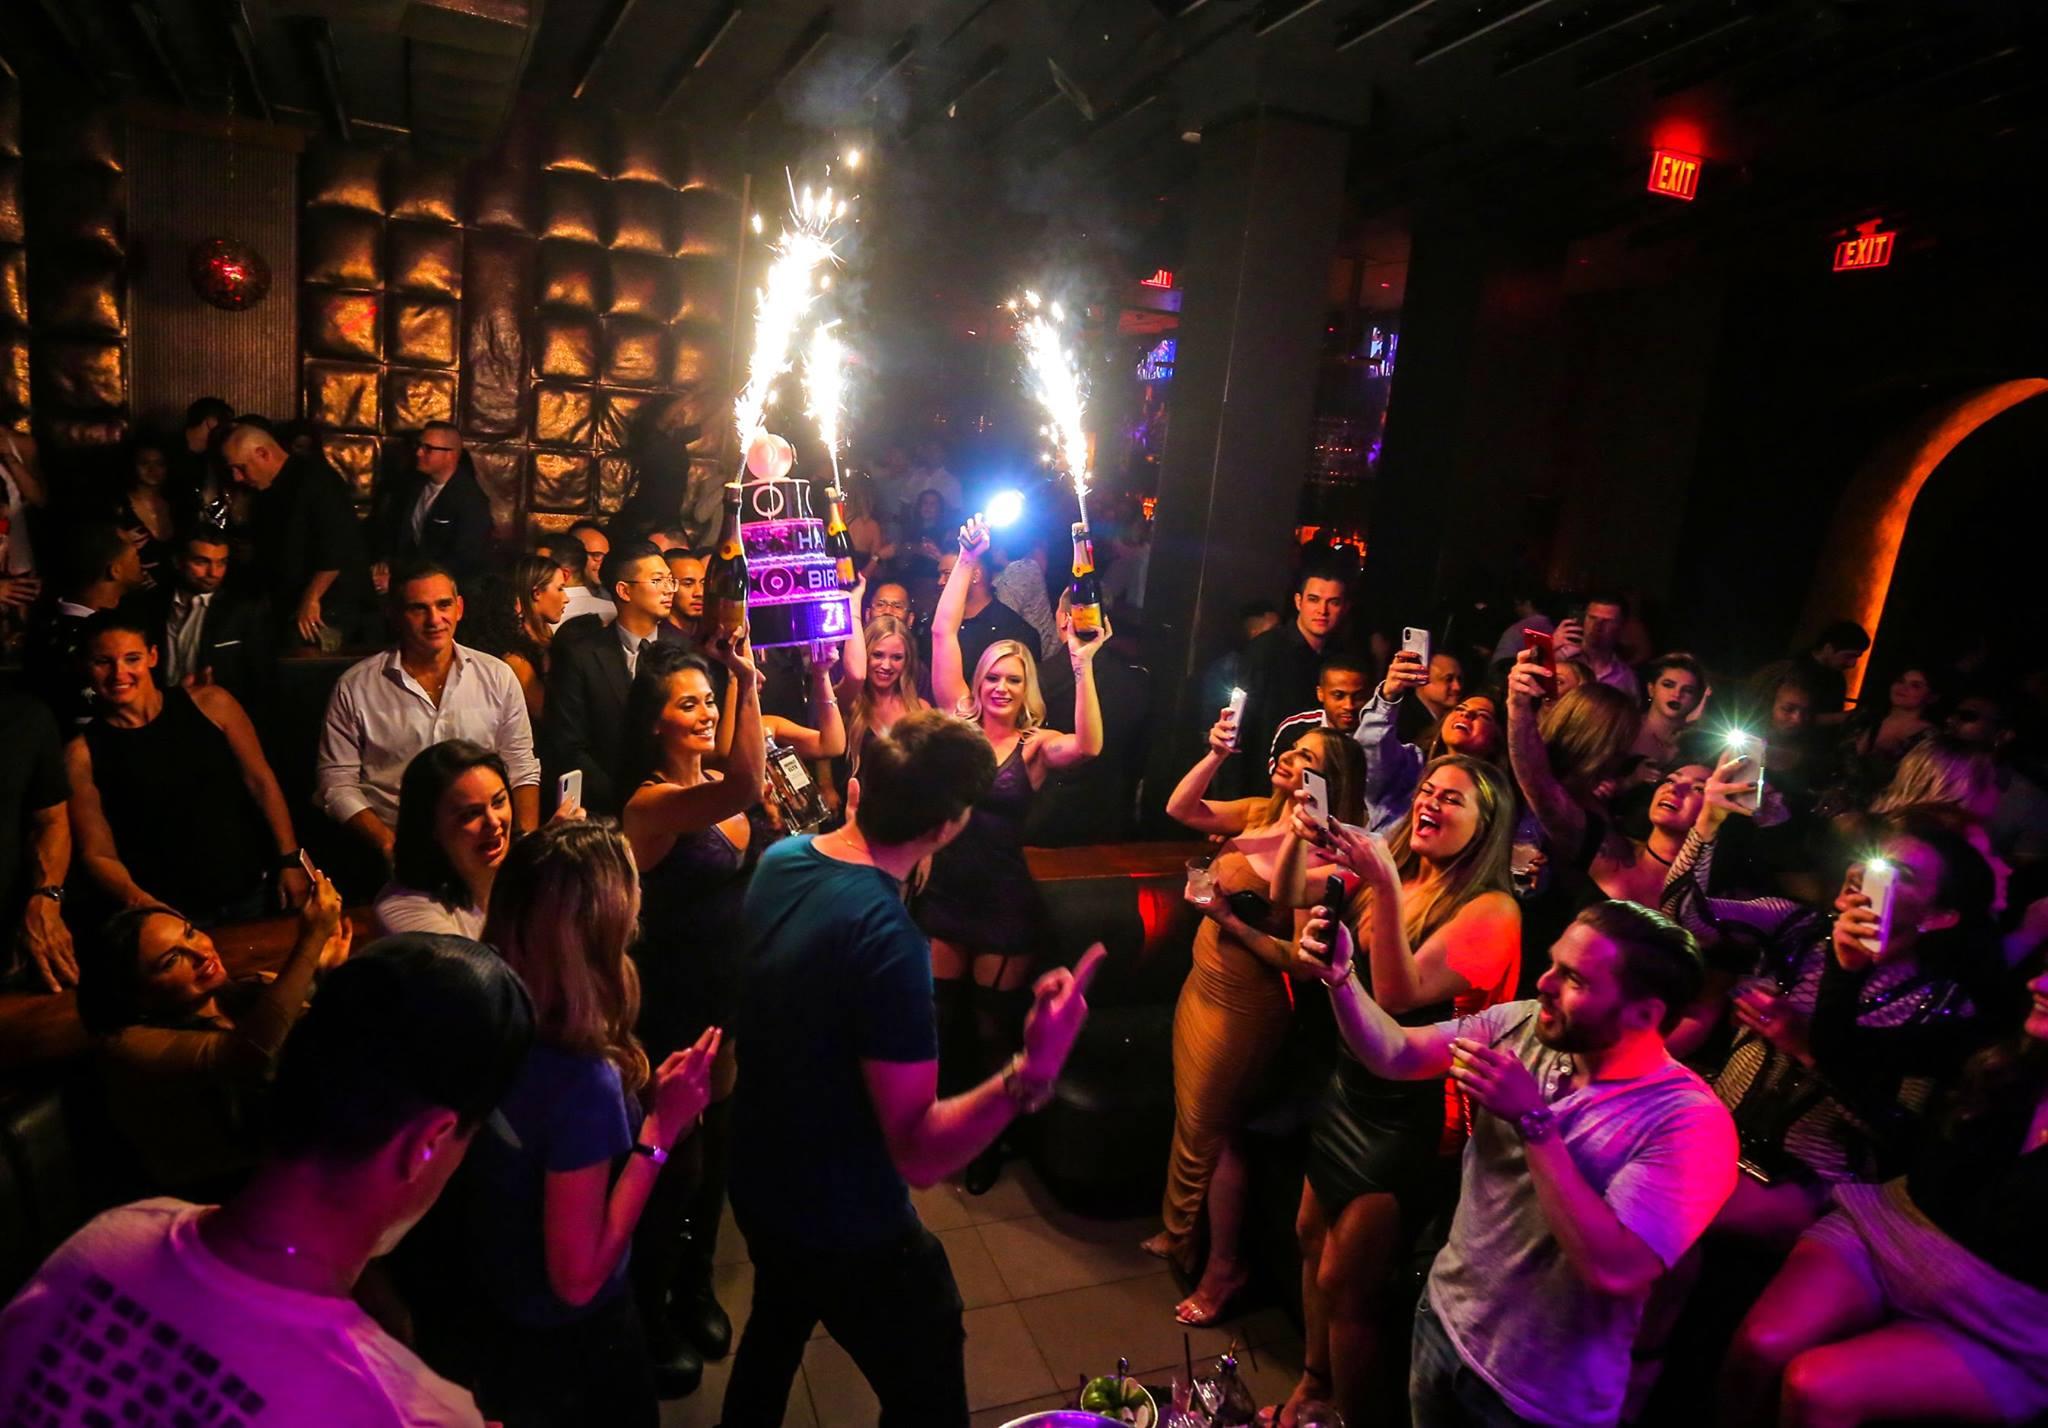 marquee nightclub elevated dance floor bottle service